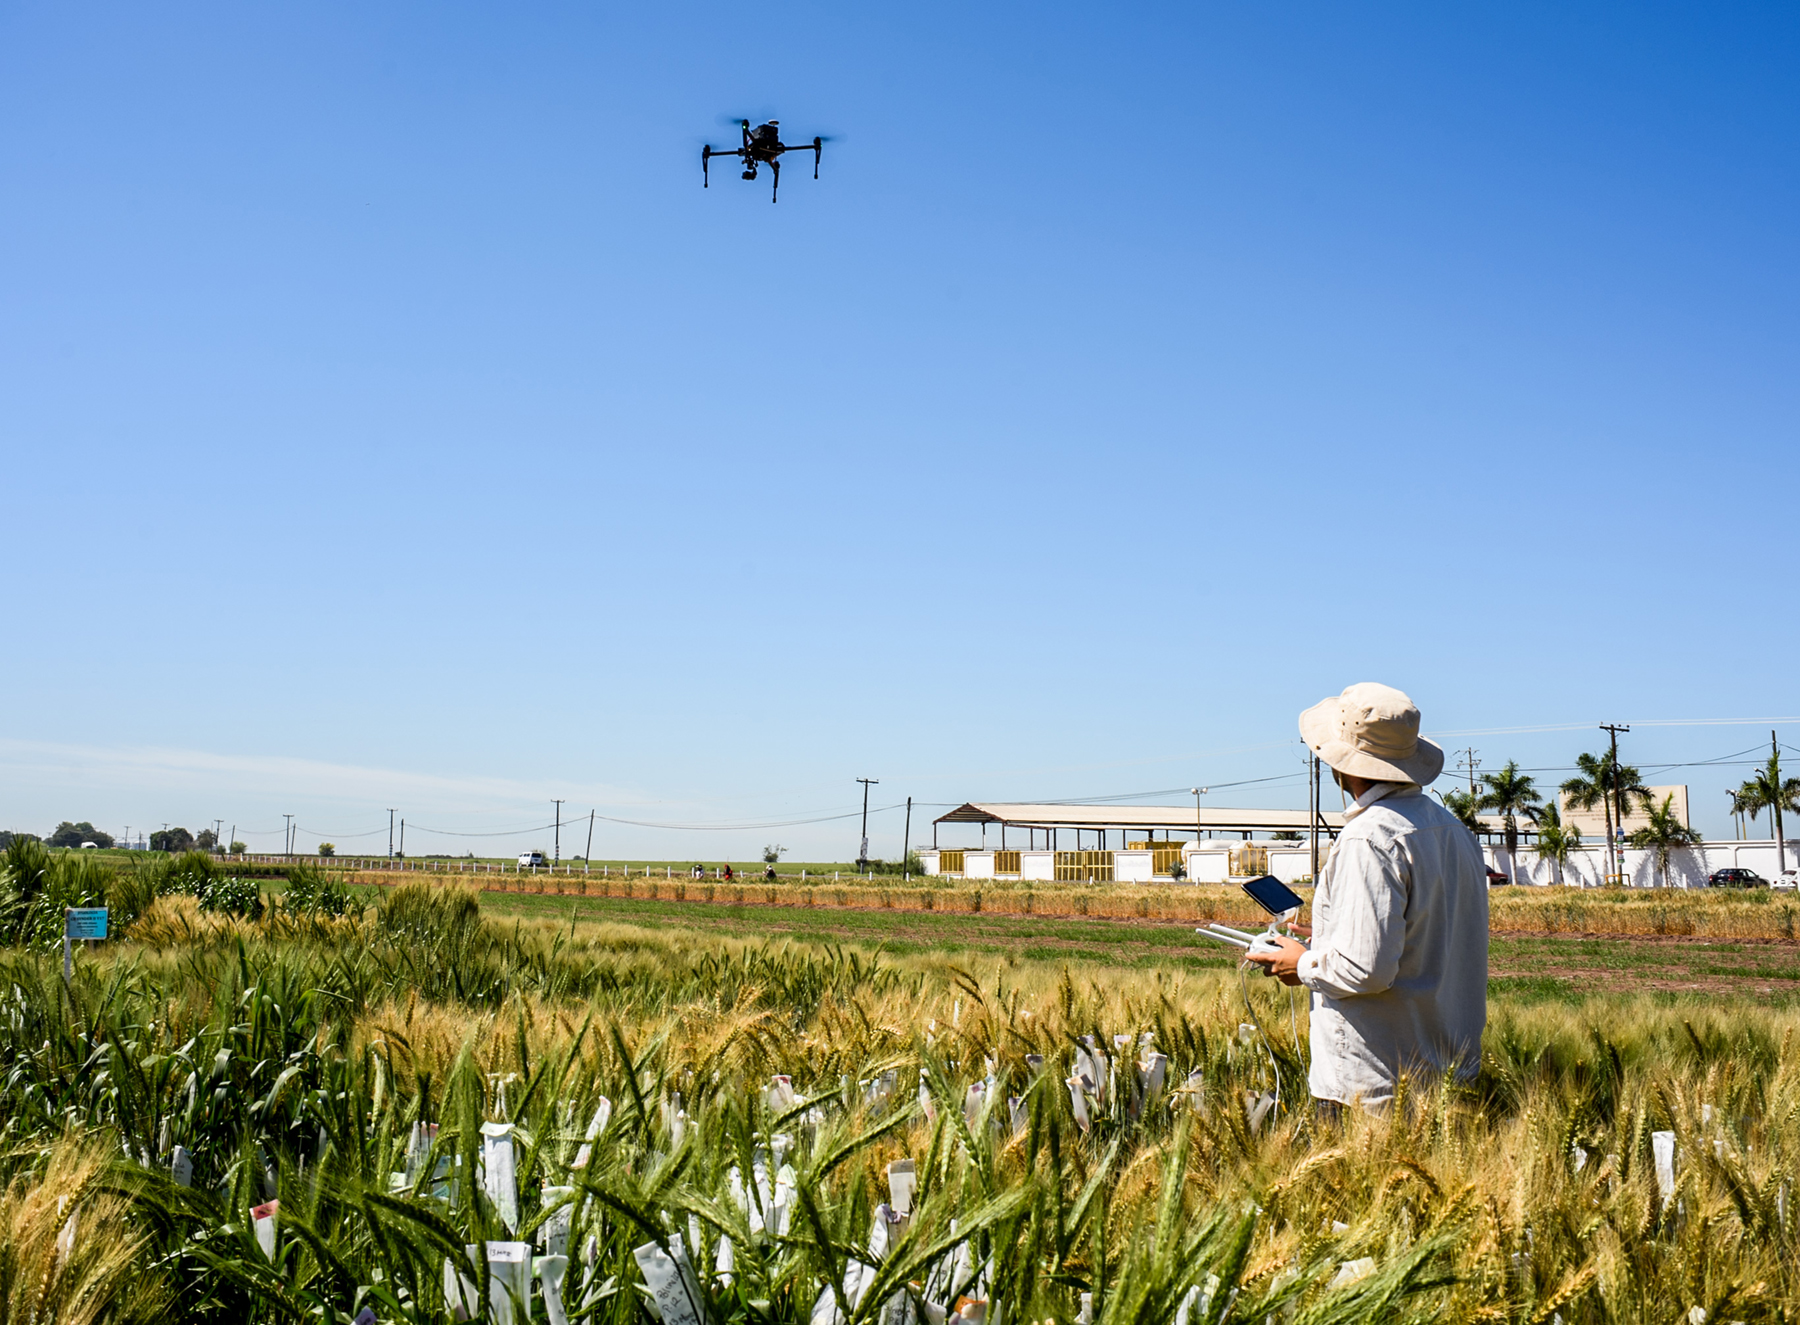 A researcher flies a UAV to collect field data at CIMMYT's experiment station in Ciudad Obregón, Mexico. (Photo: Alfonso Cortés/CIMMYT)